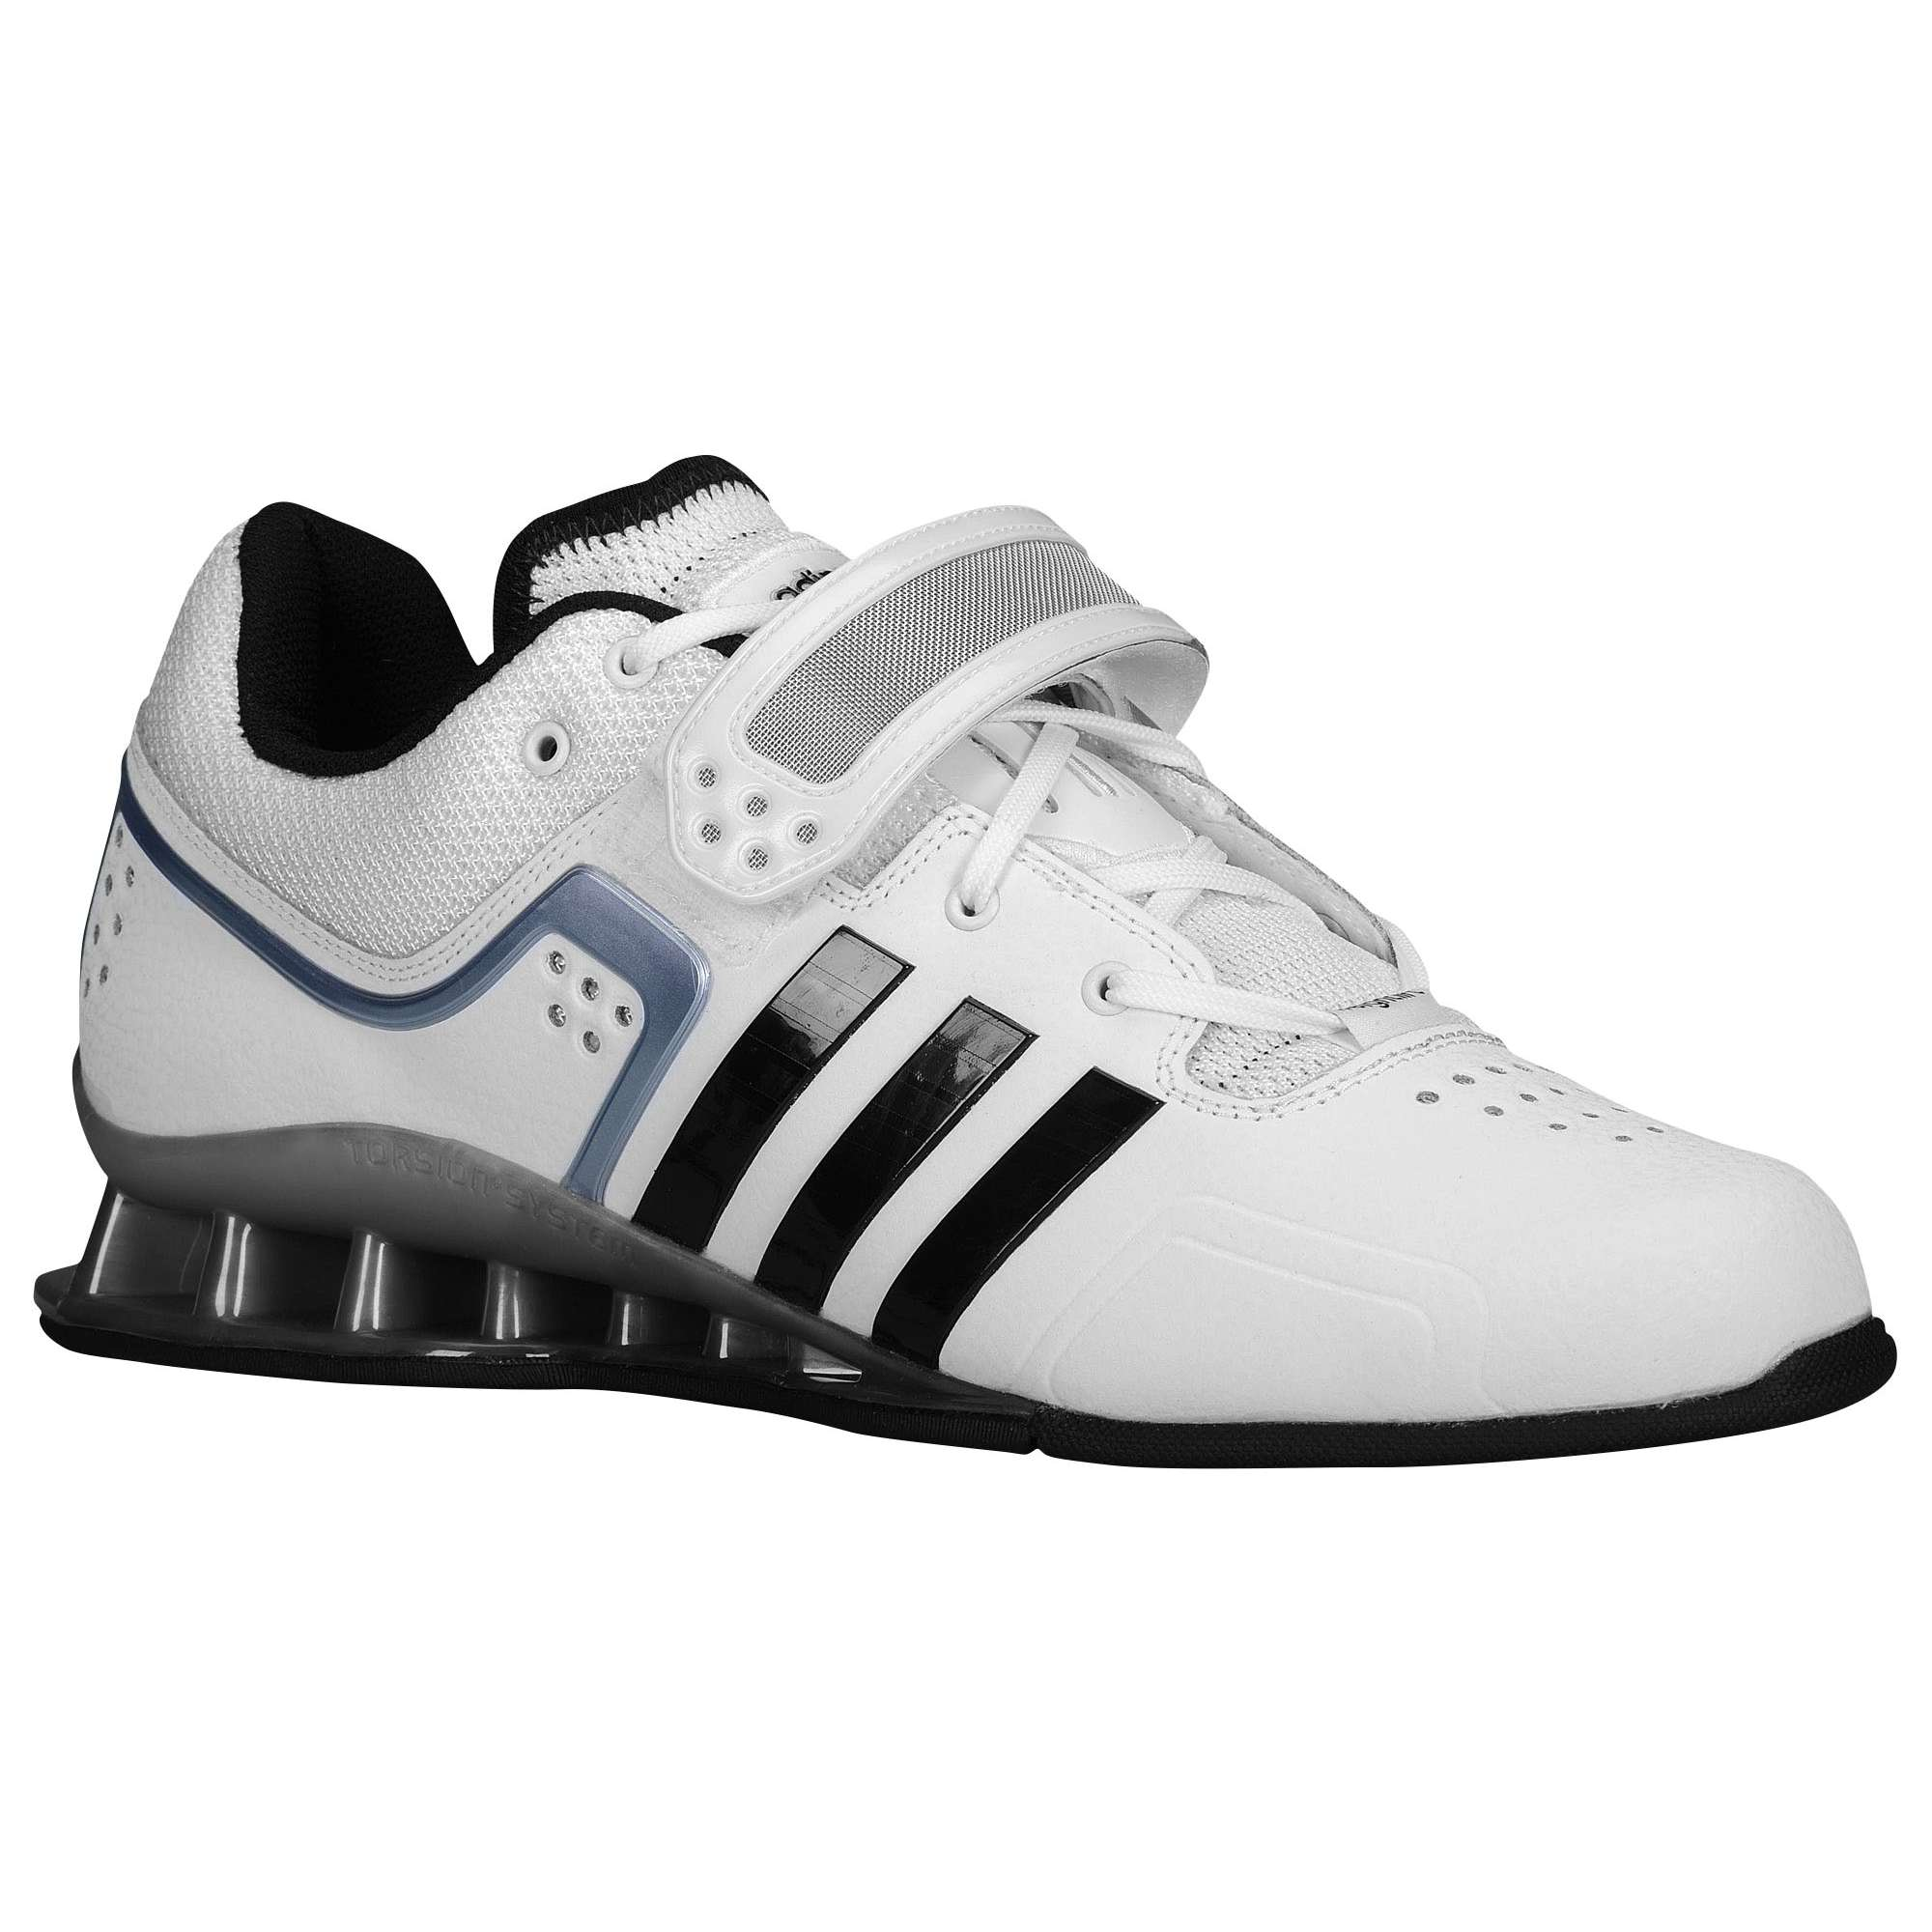 adidas powerlift schoenen